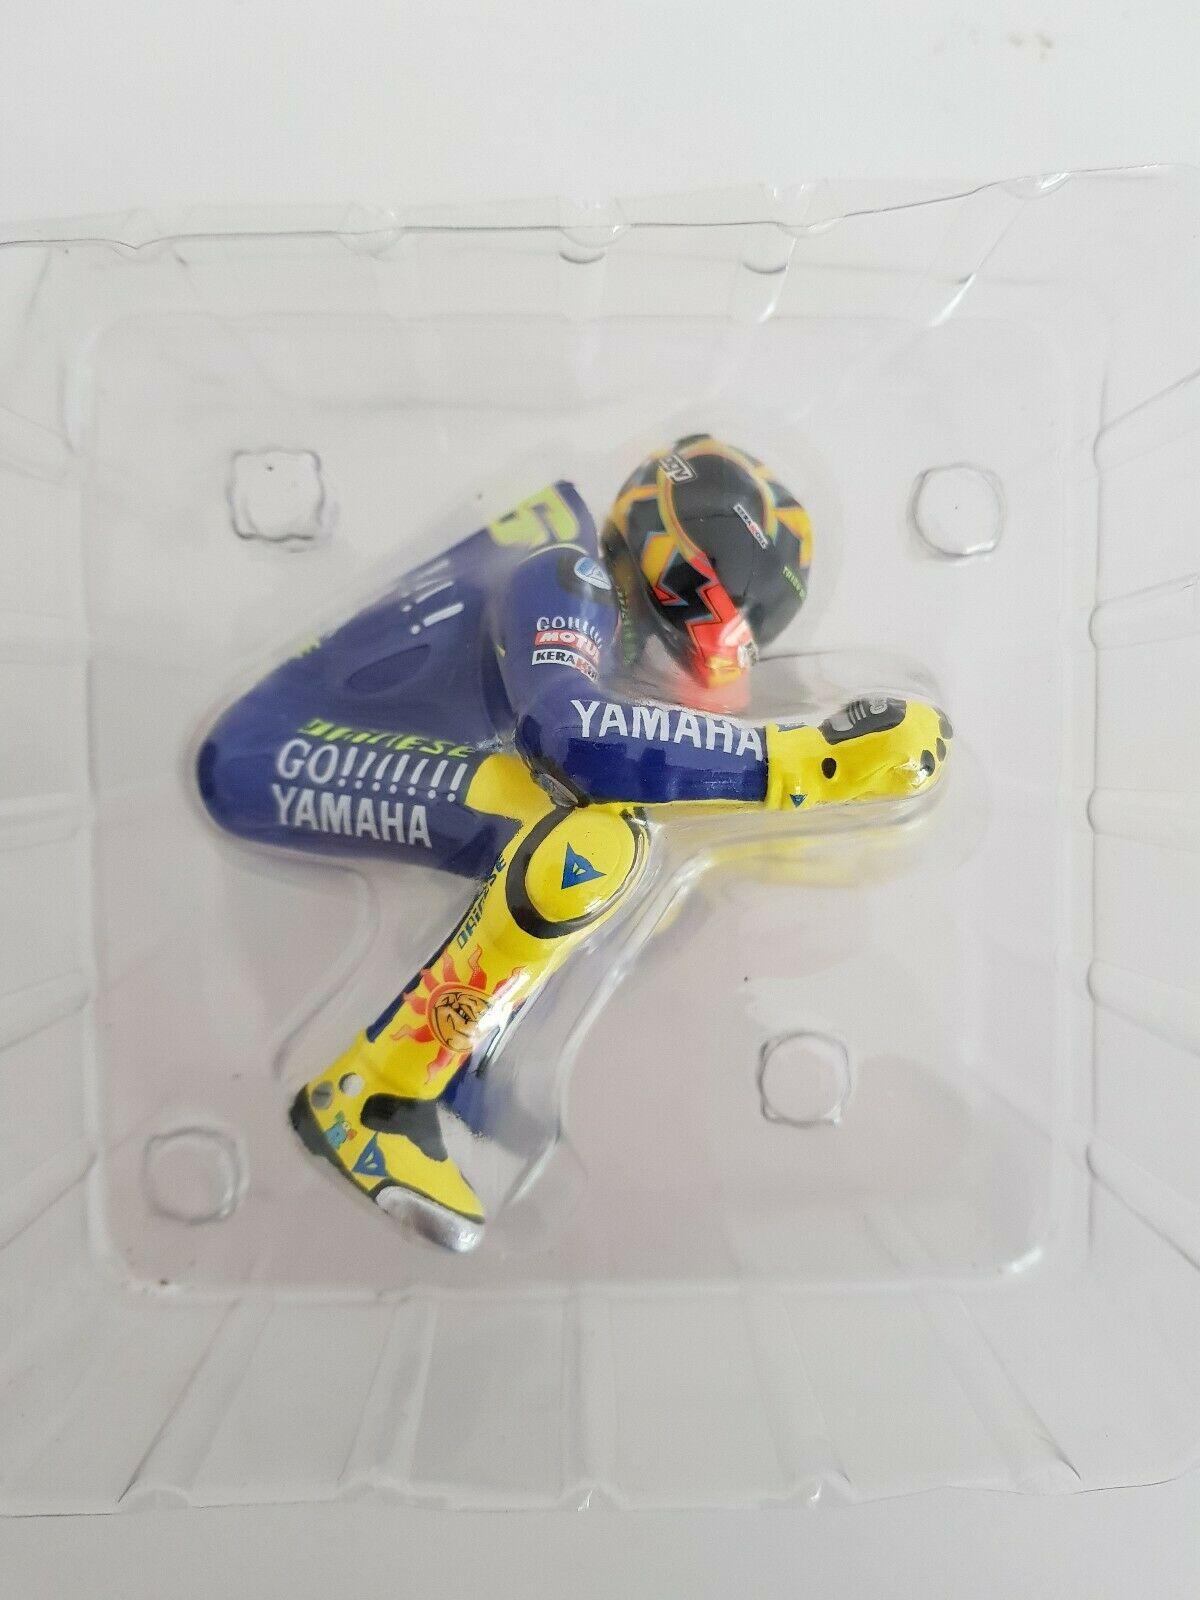 Valentino Rossi 2005 Riding Position.